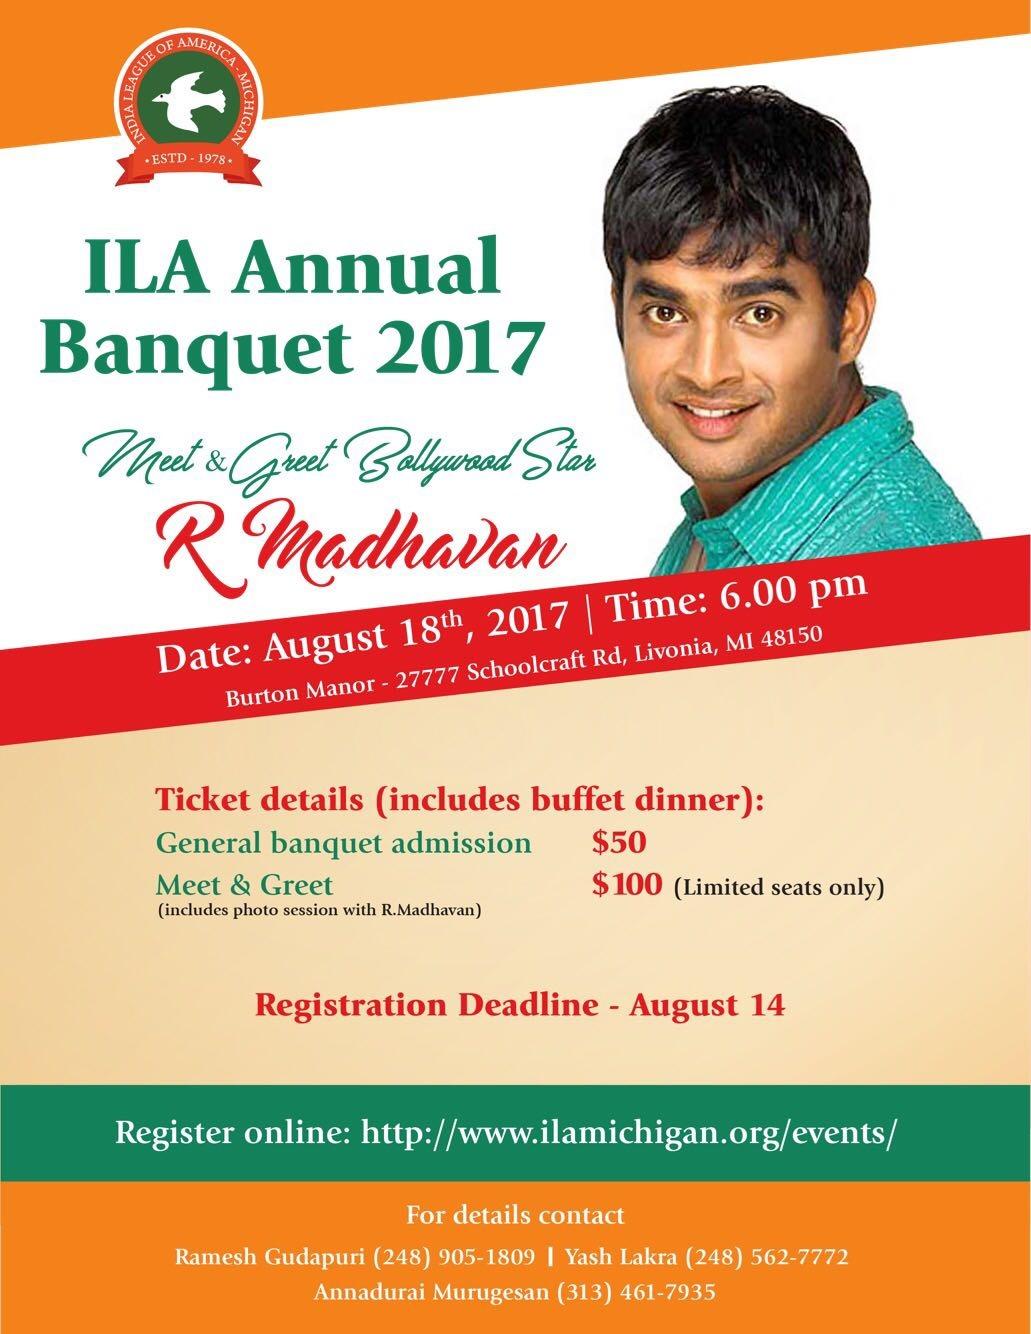 ILA Banquet